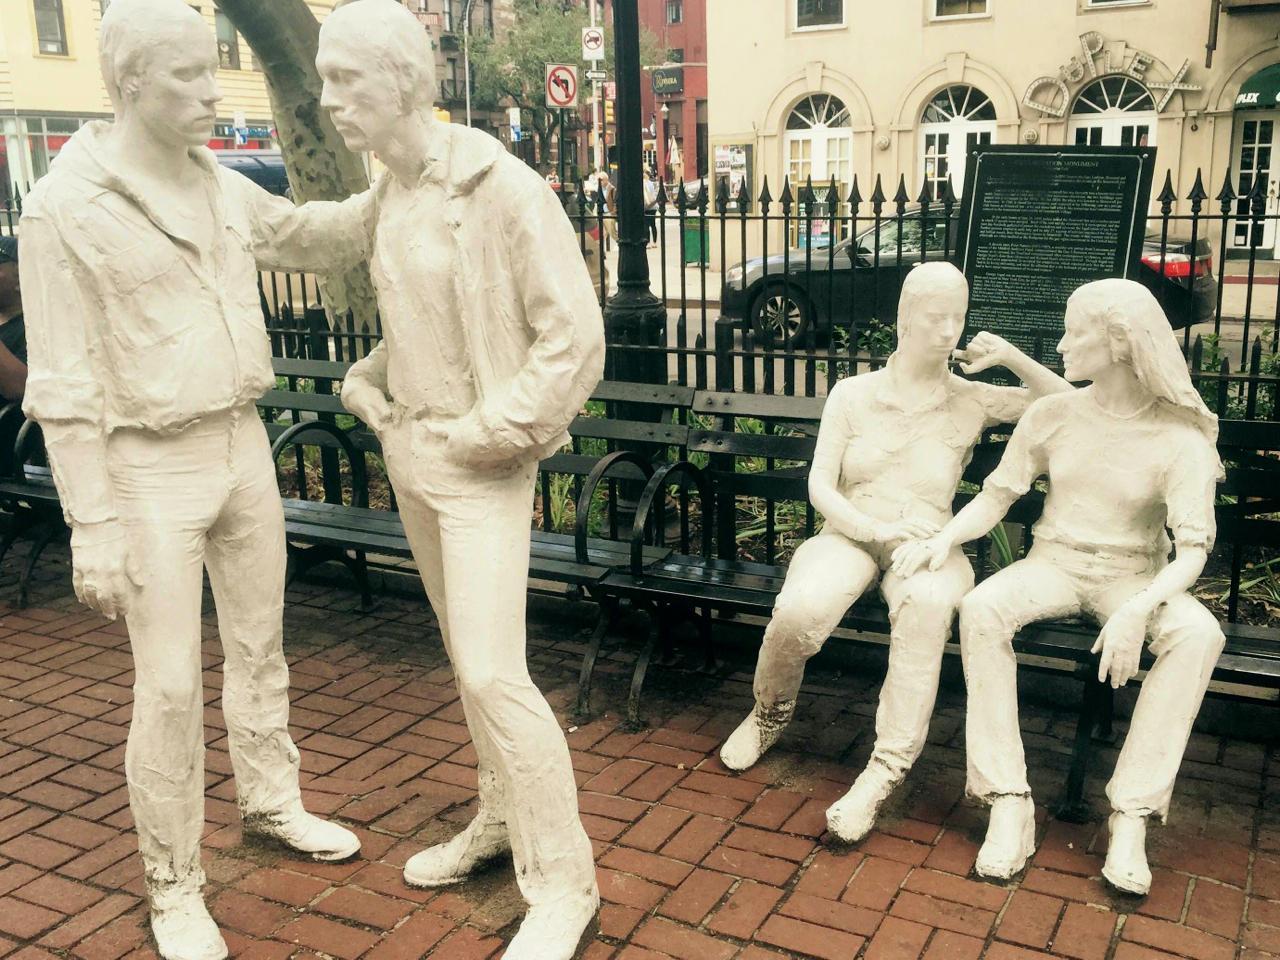 George Segal sculpture at Christopher Park.